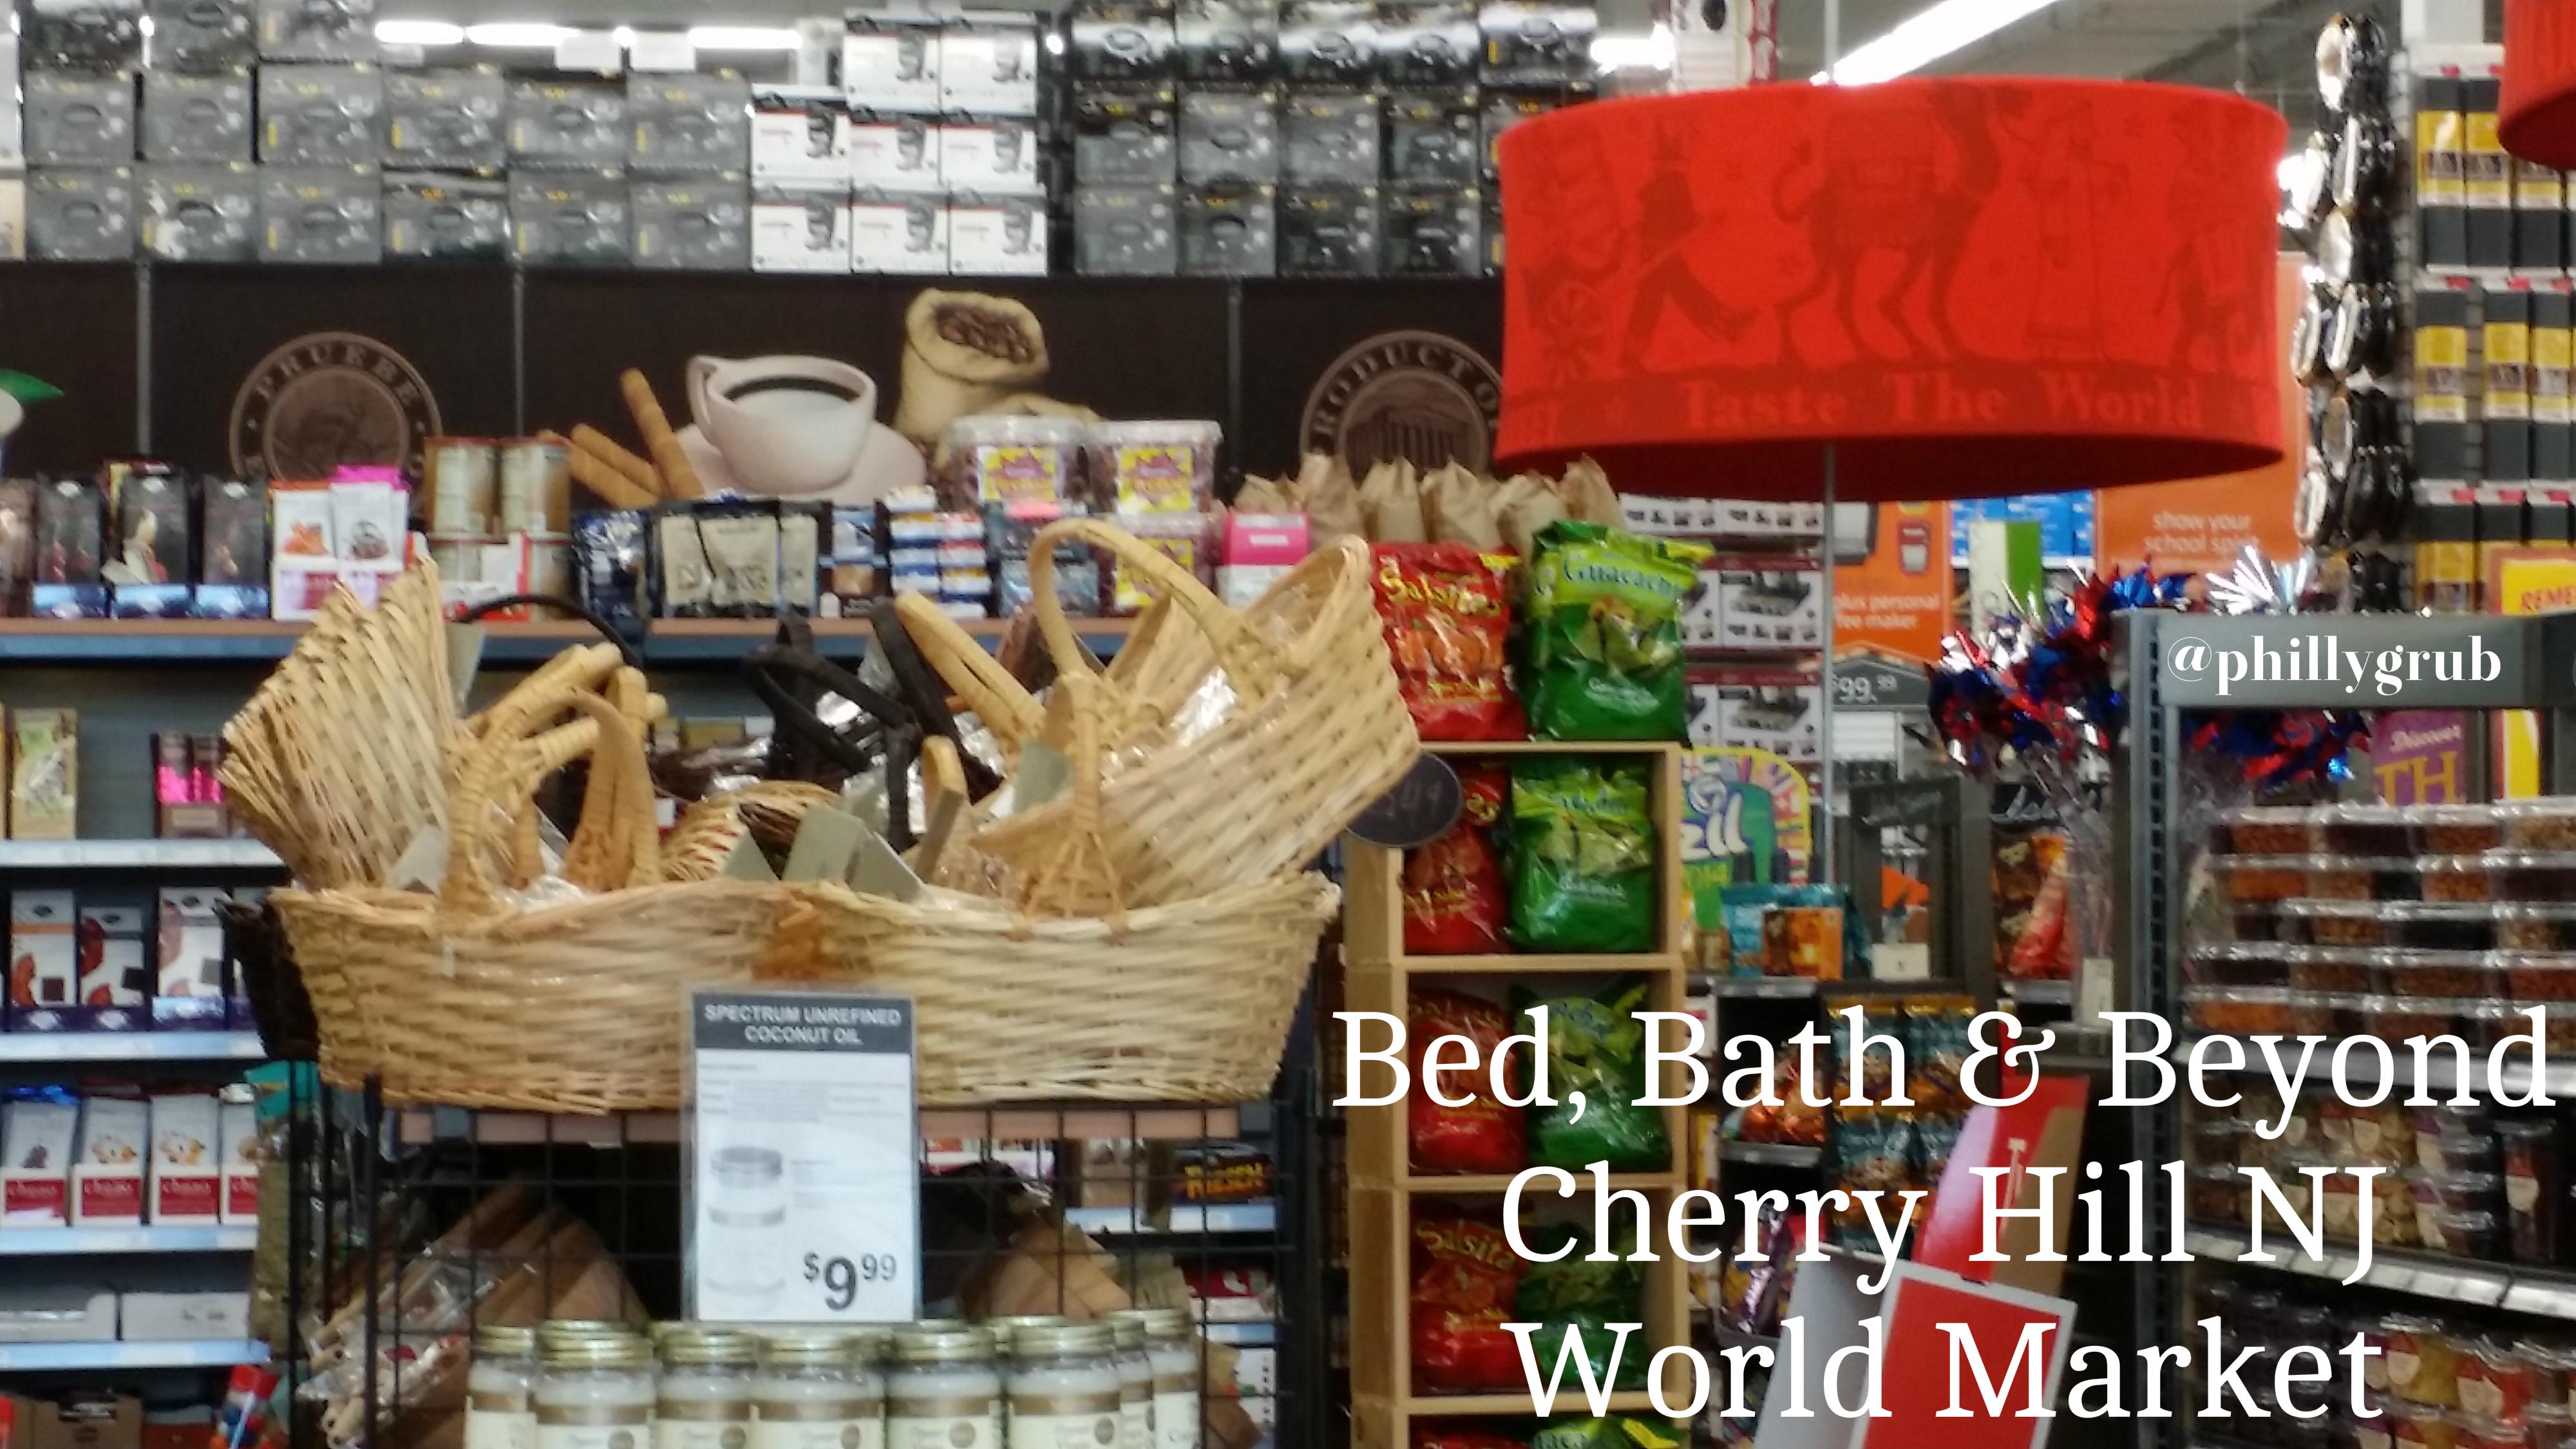 image  Bed Bath  amp  Beyond Cherry Hill NJ World Market. Bed Bath  amp  Beyond World Market Cherry Hill NJ   Philly Grub